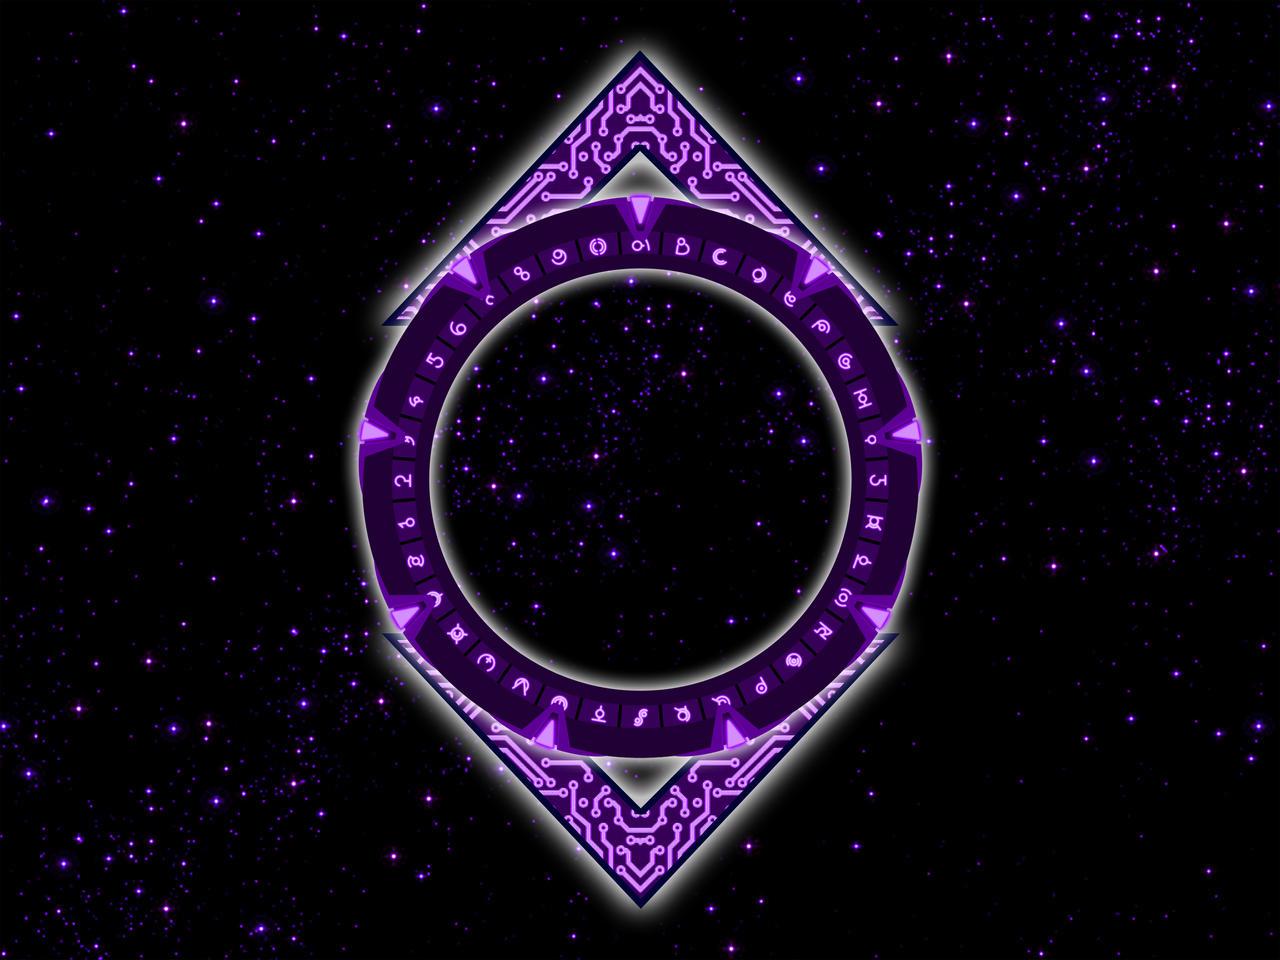 Indigo lantern corps symbol - photo#20